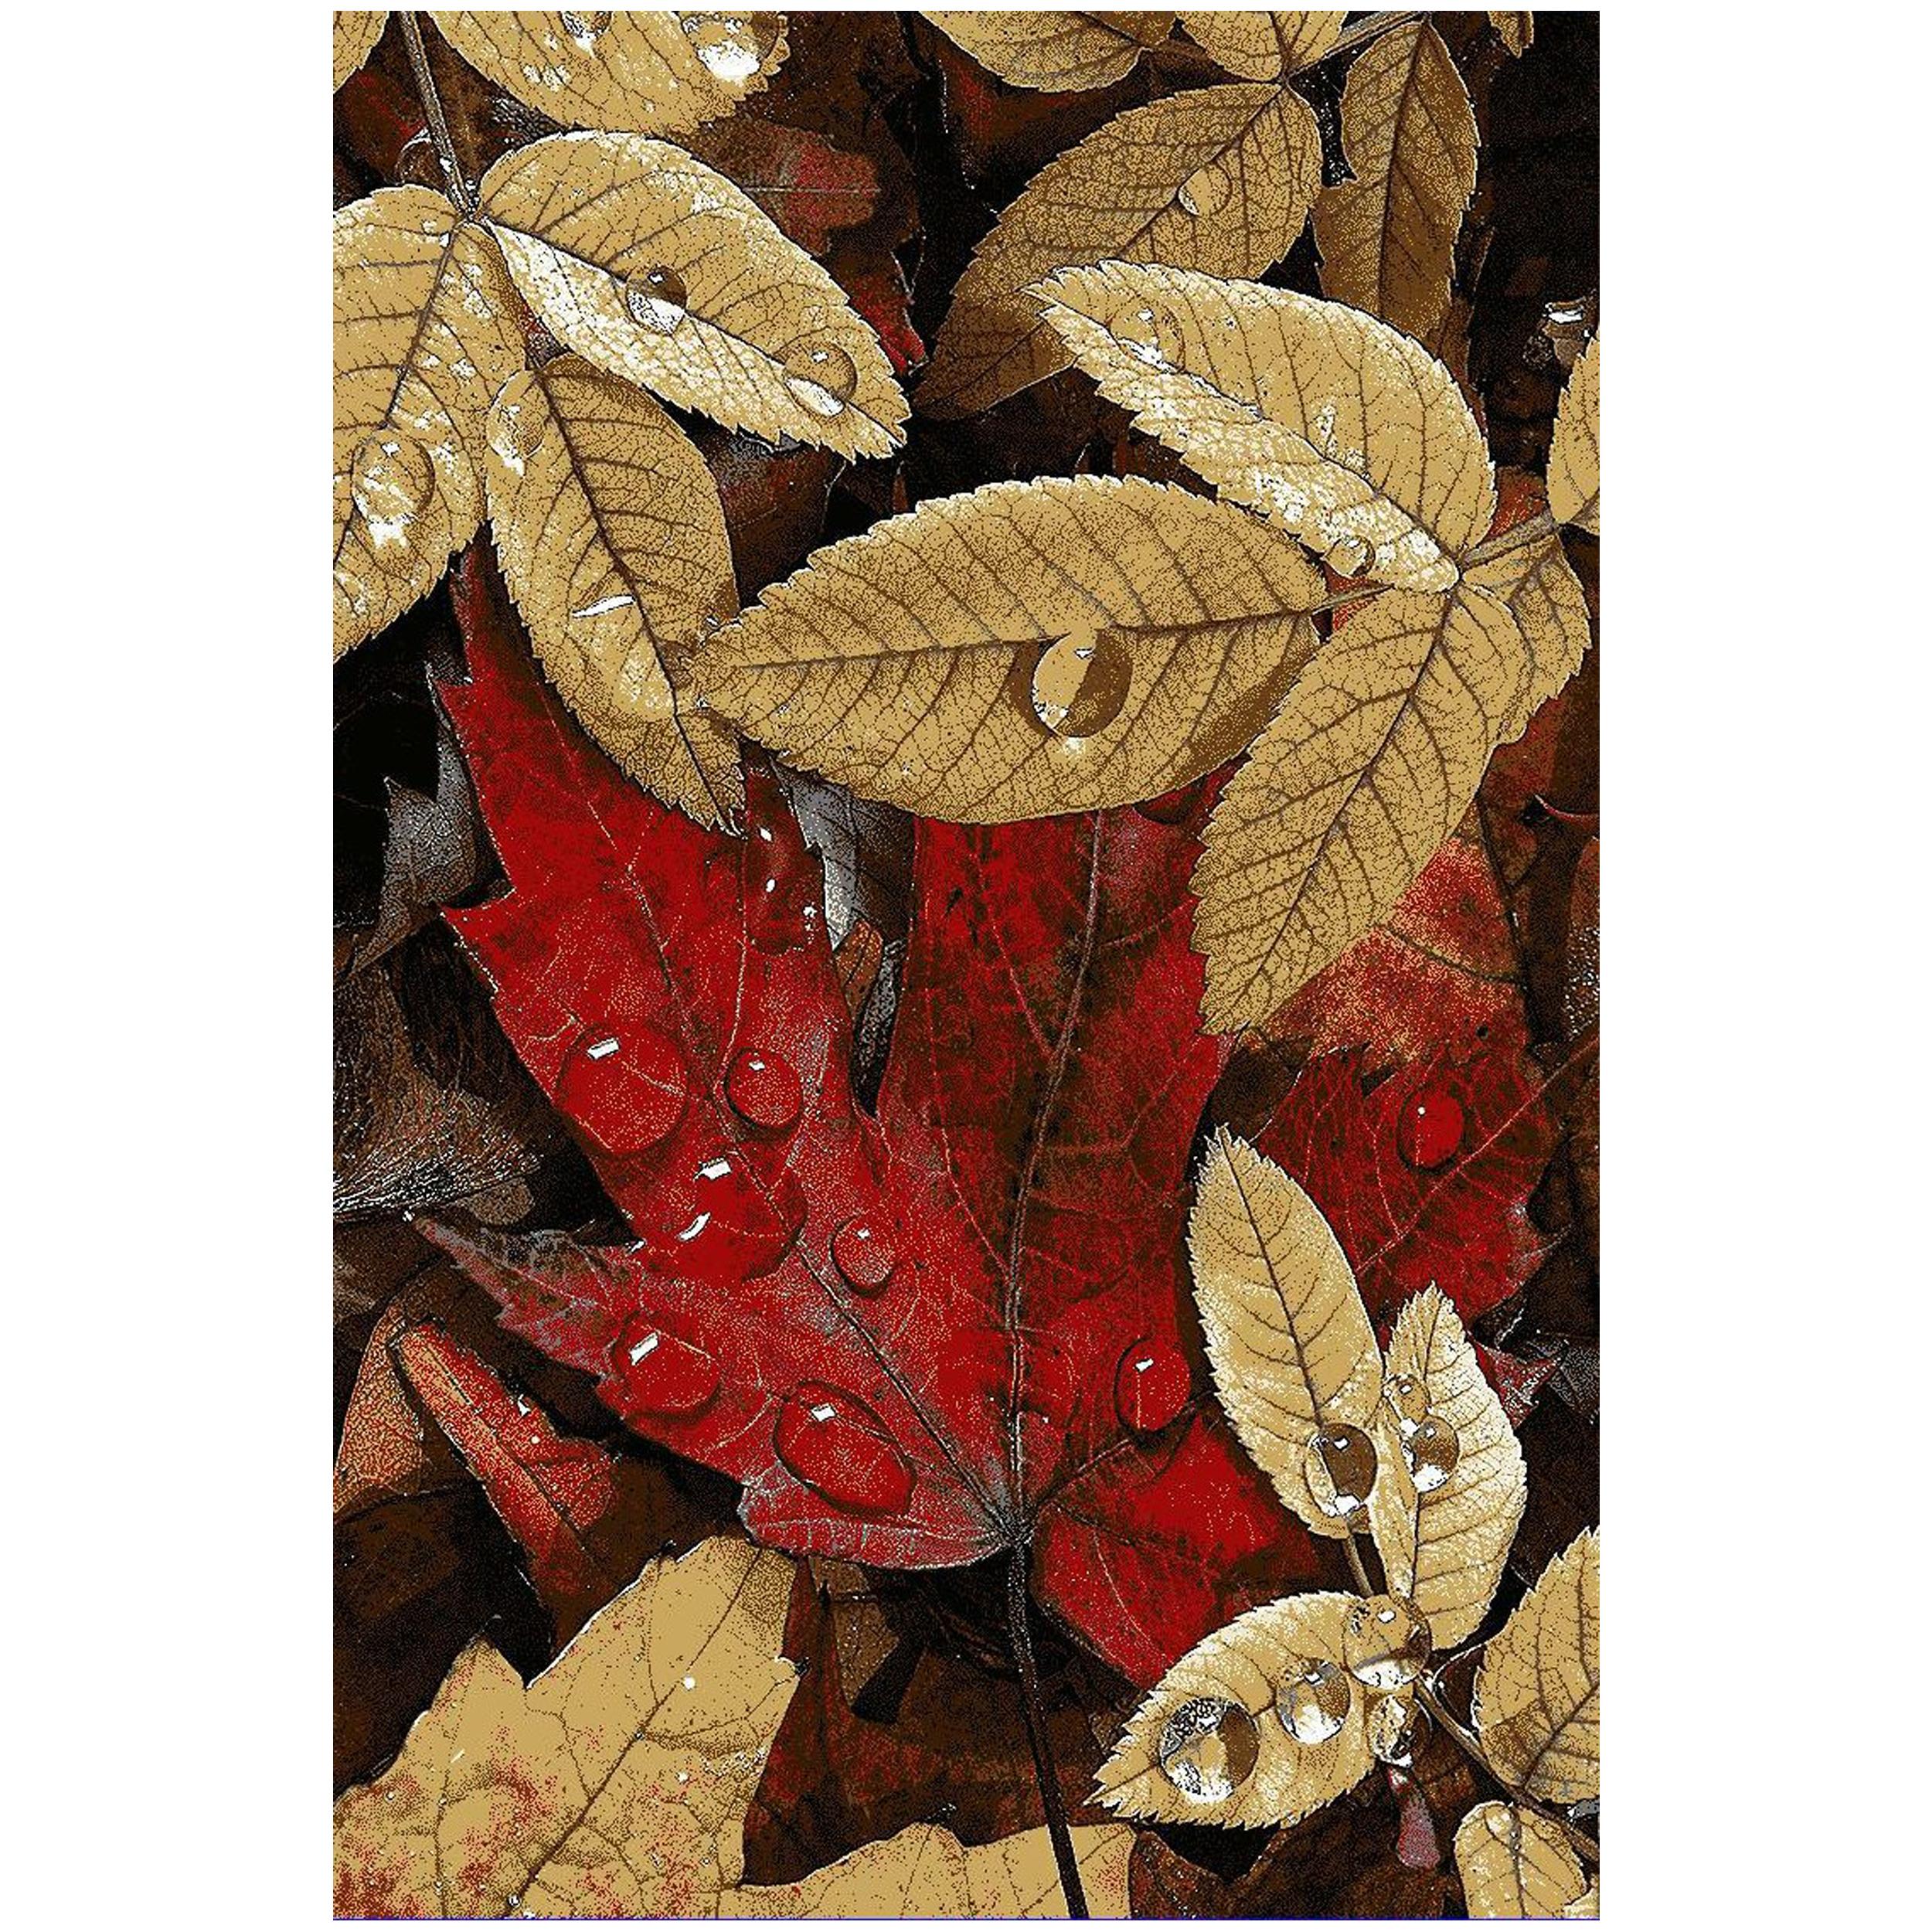 عکس فرش ماشيني فانتزی سه بعدی طرح پاییز کد T0114